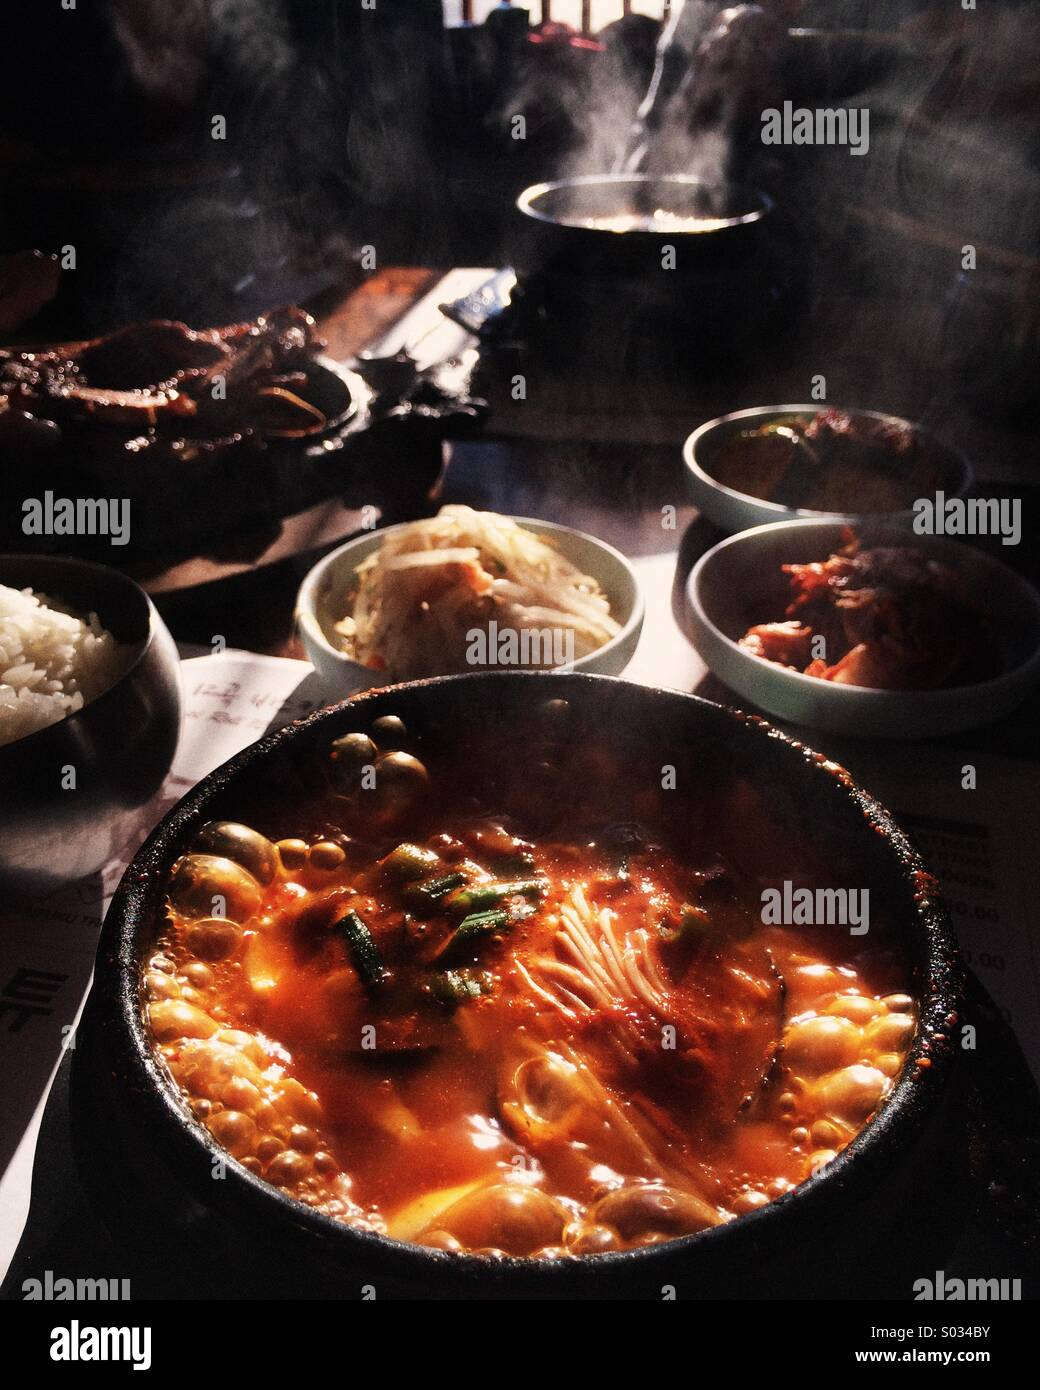 Soondubu, Coréen, ragoût de tofu chaud servi chaud bouillant avec peychaud et galbi dans un restaurant Photo Stock